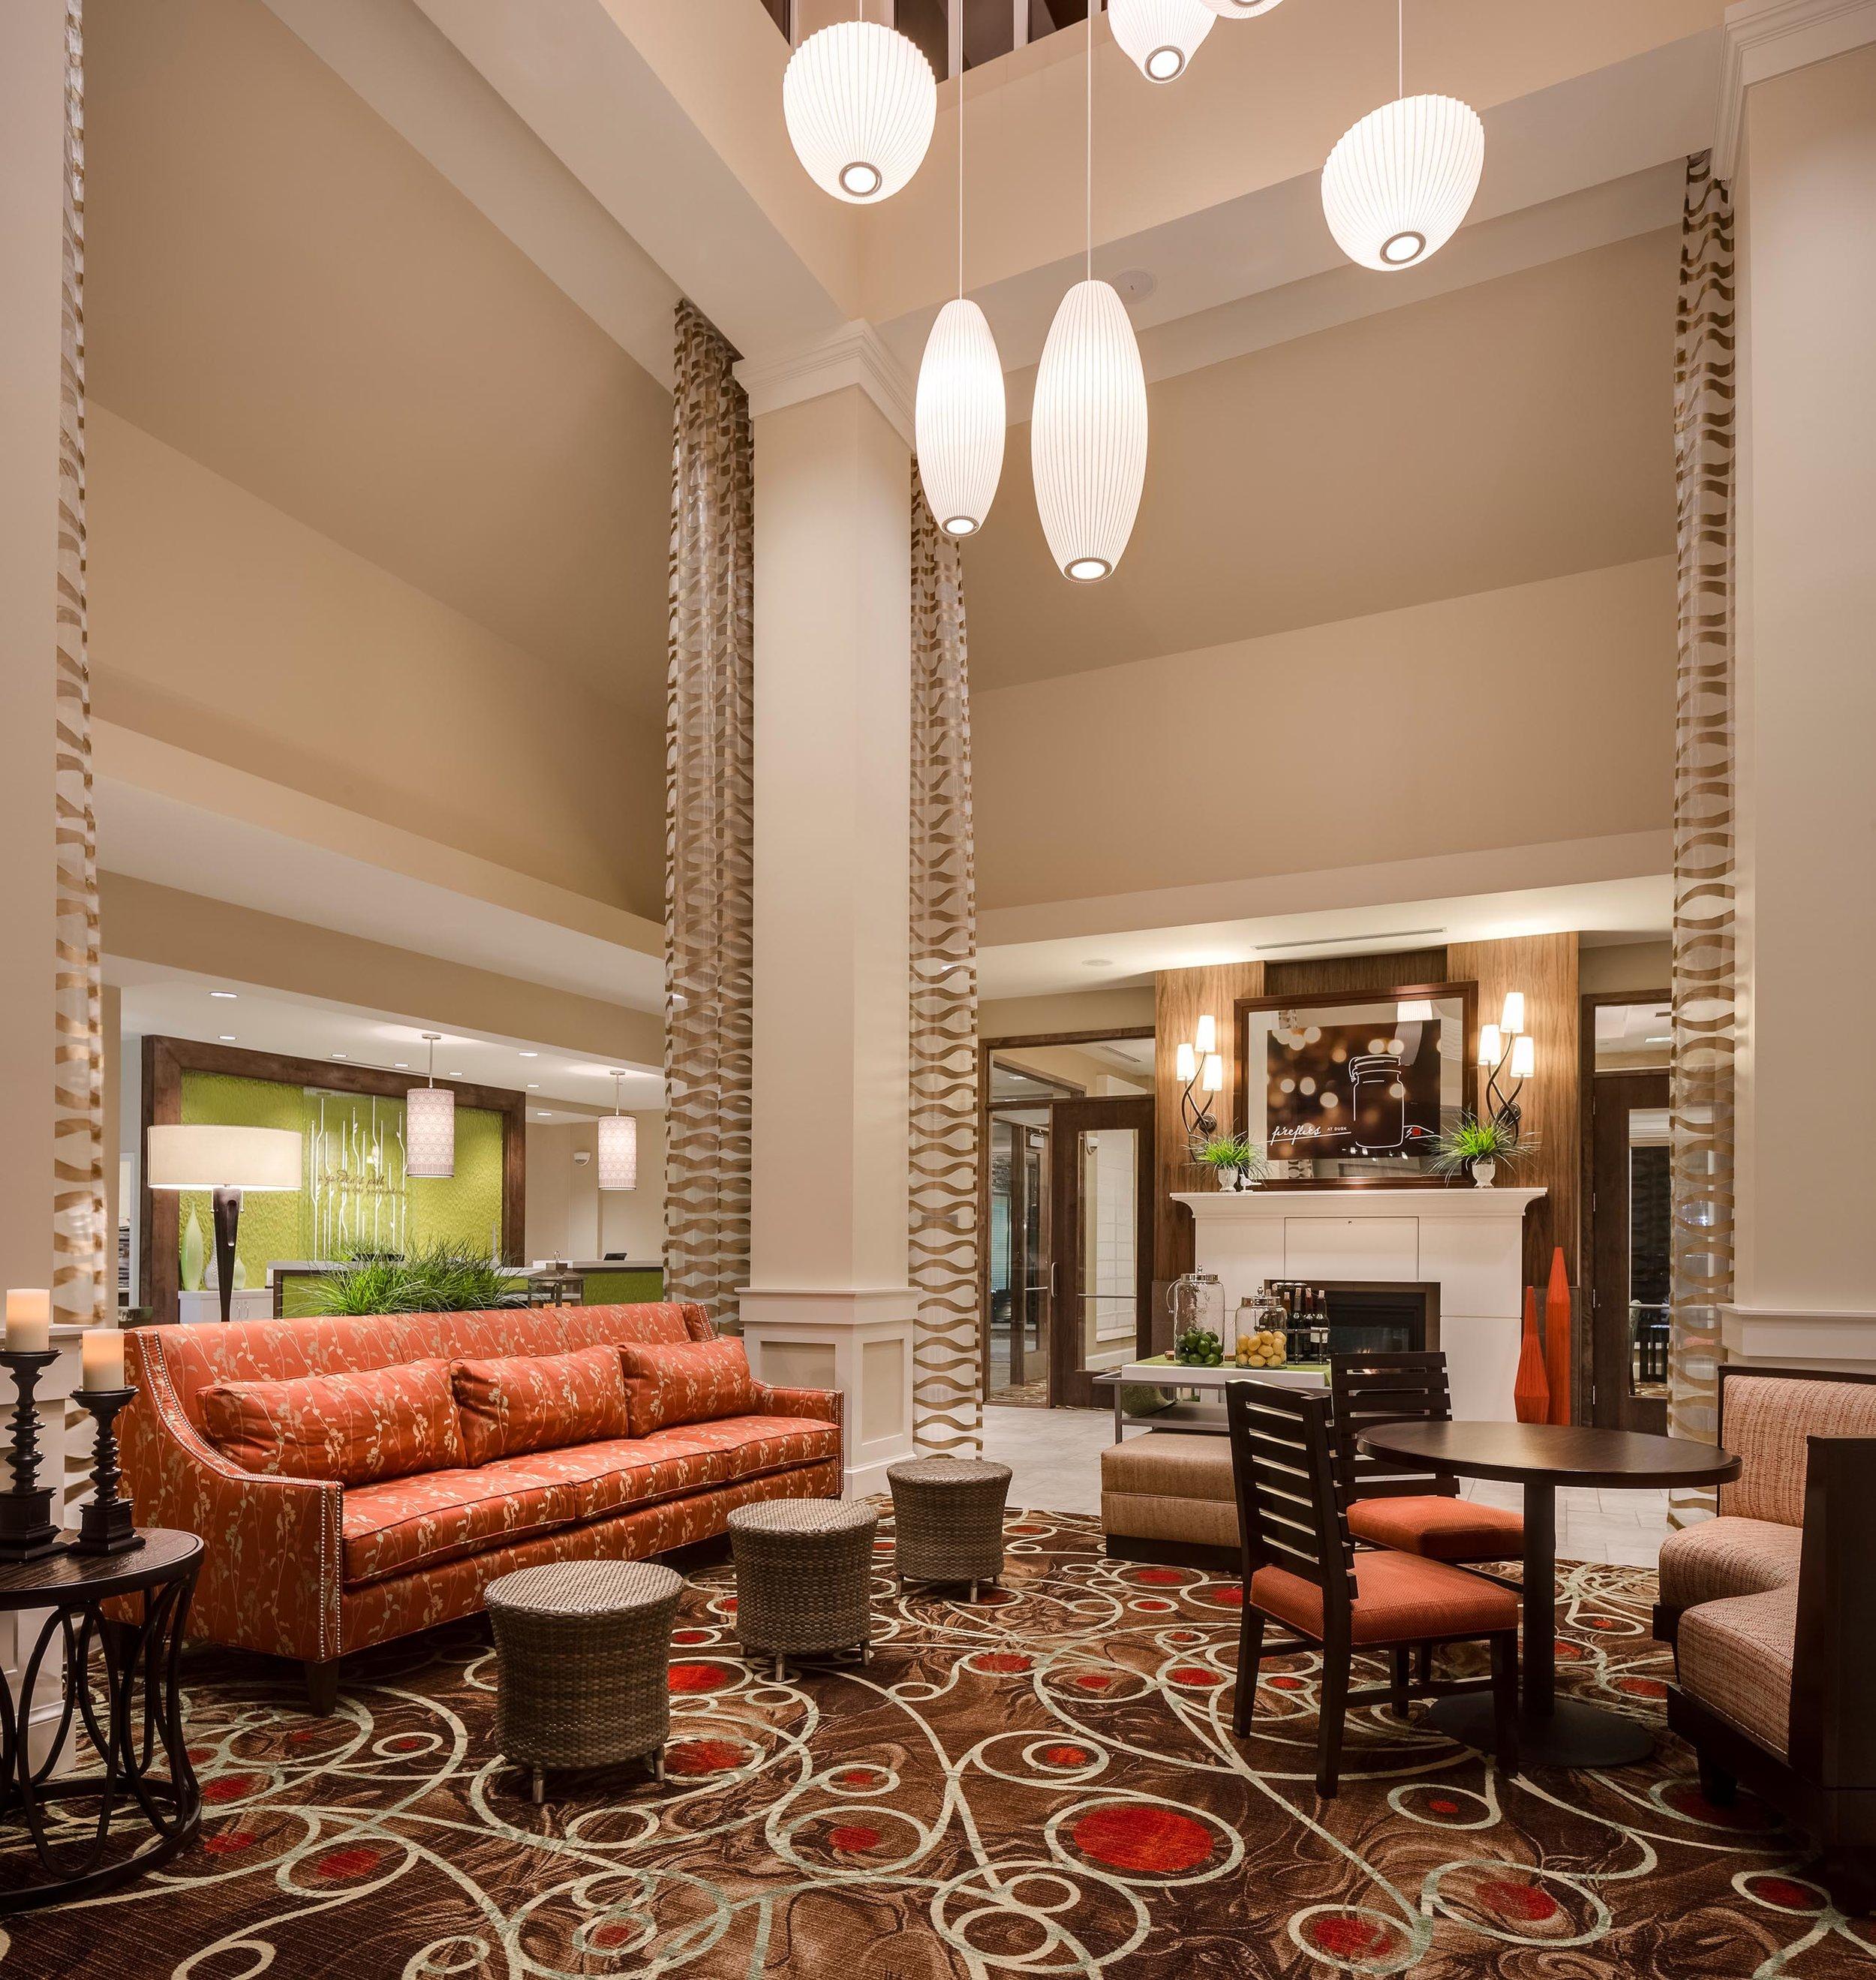 Lobby seating area at the Hilton Garden Inn in Bettendorf, IA